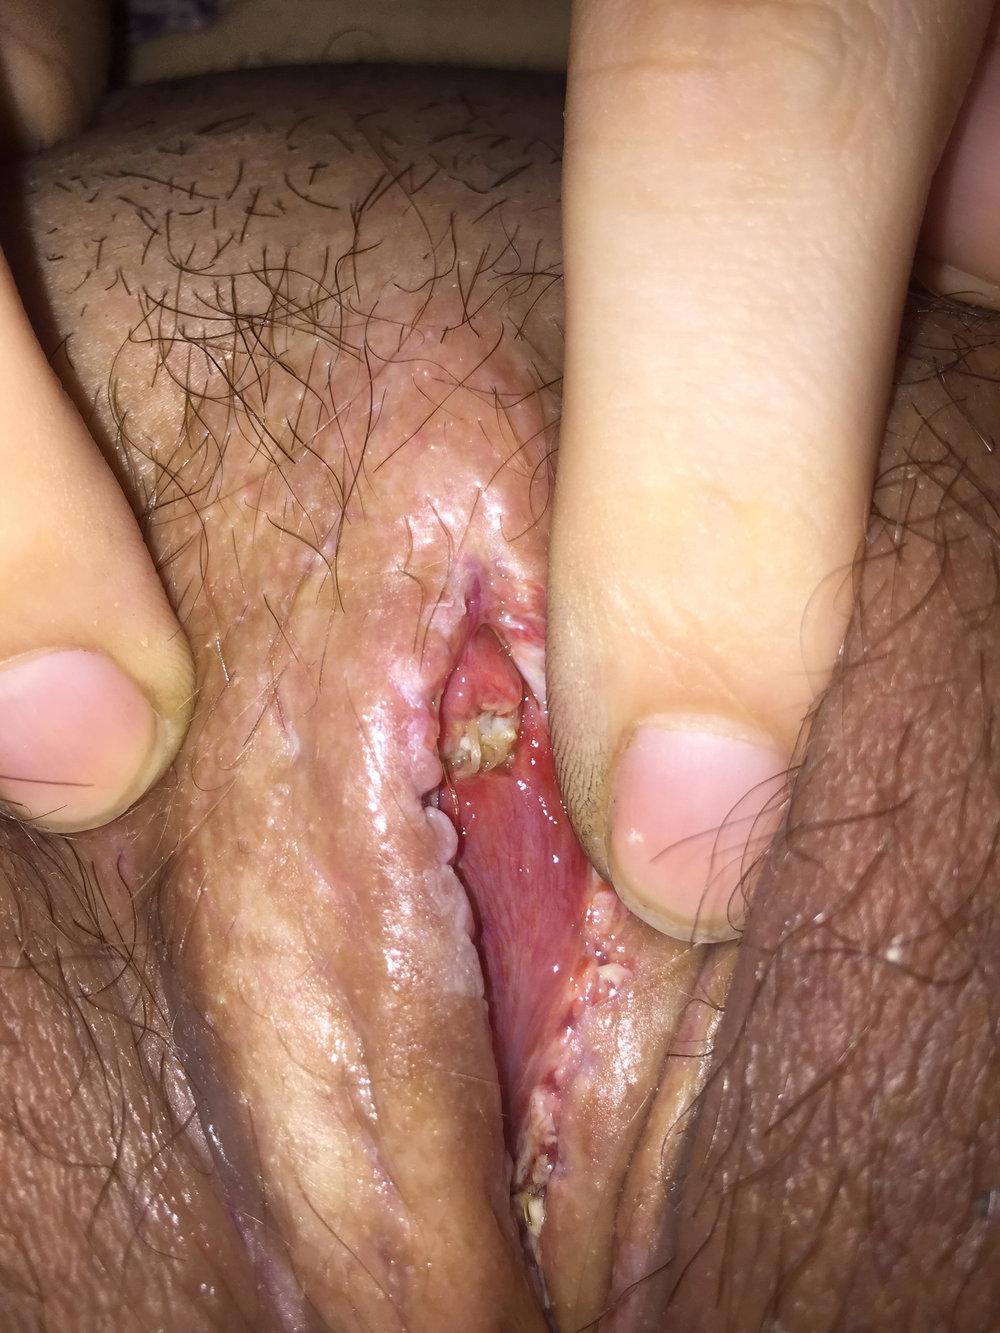 clitoris2.jpg